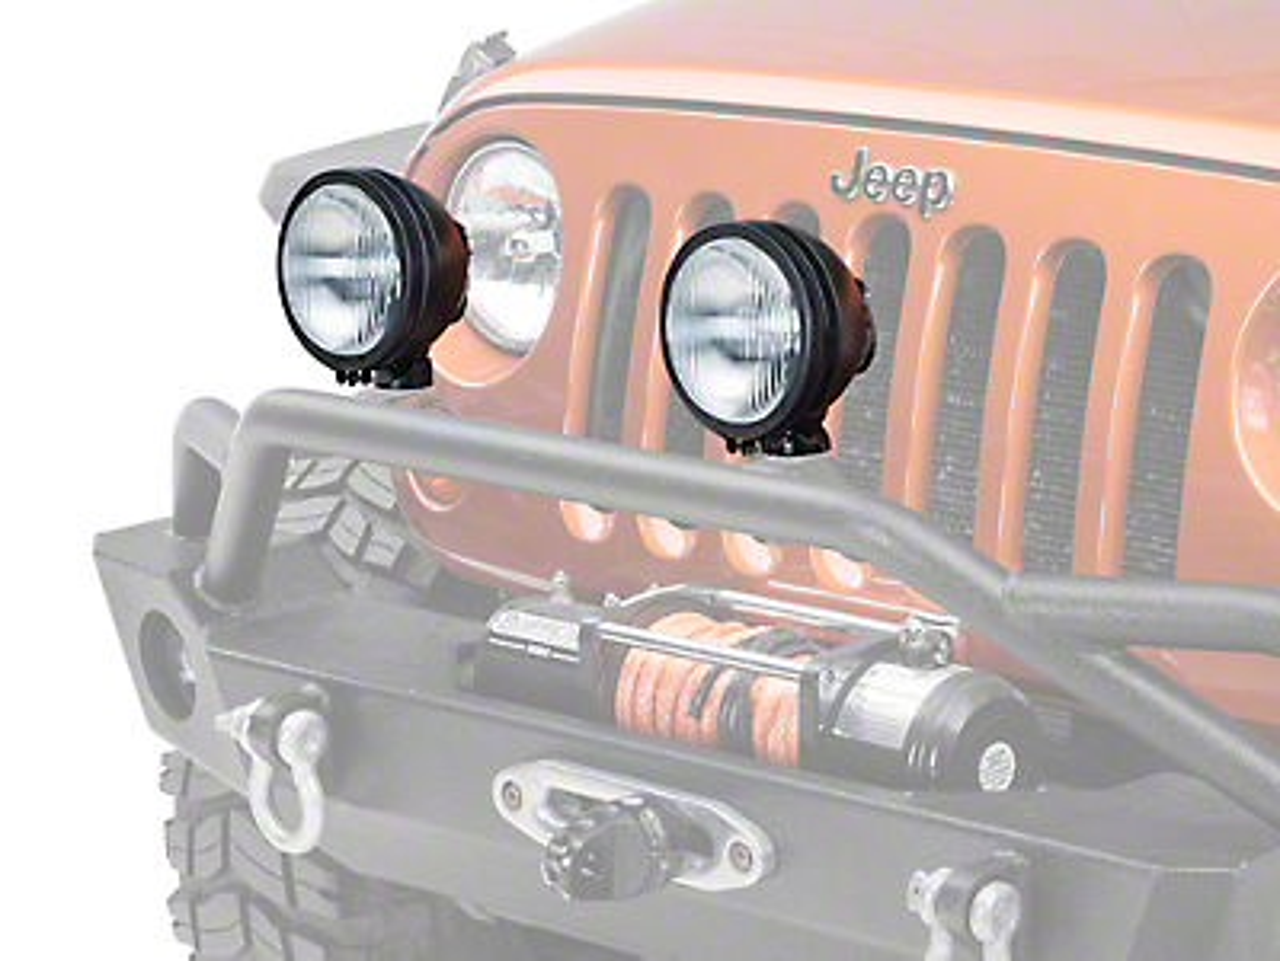 Rugged Ridge 6 in. Round HID Off-Road Fog Lights - Black - Pair (87-13 Jeep Wrangler YJ, TJ & JK)